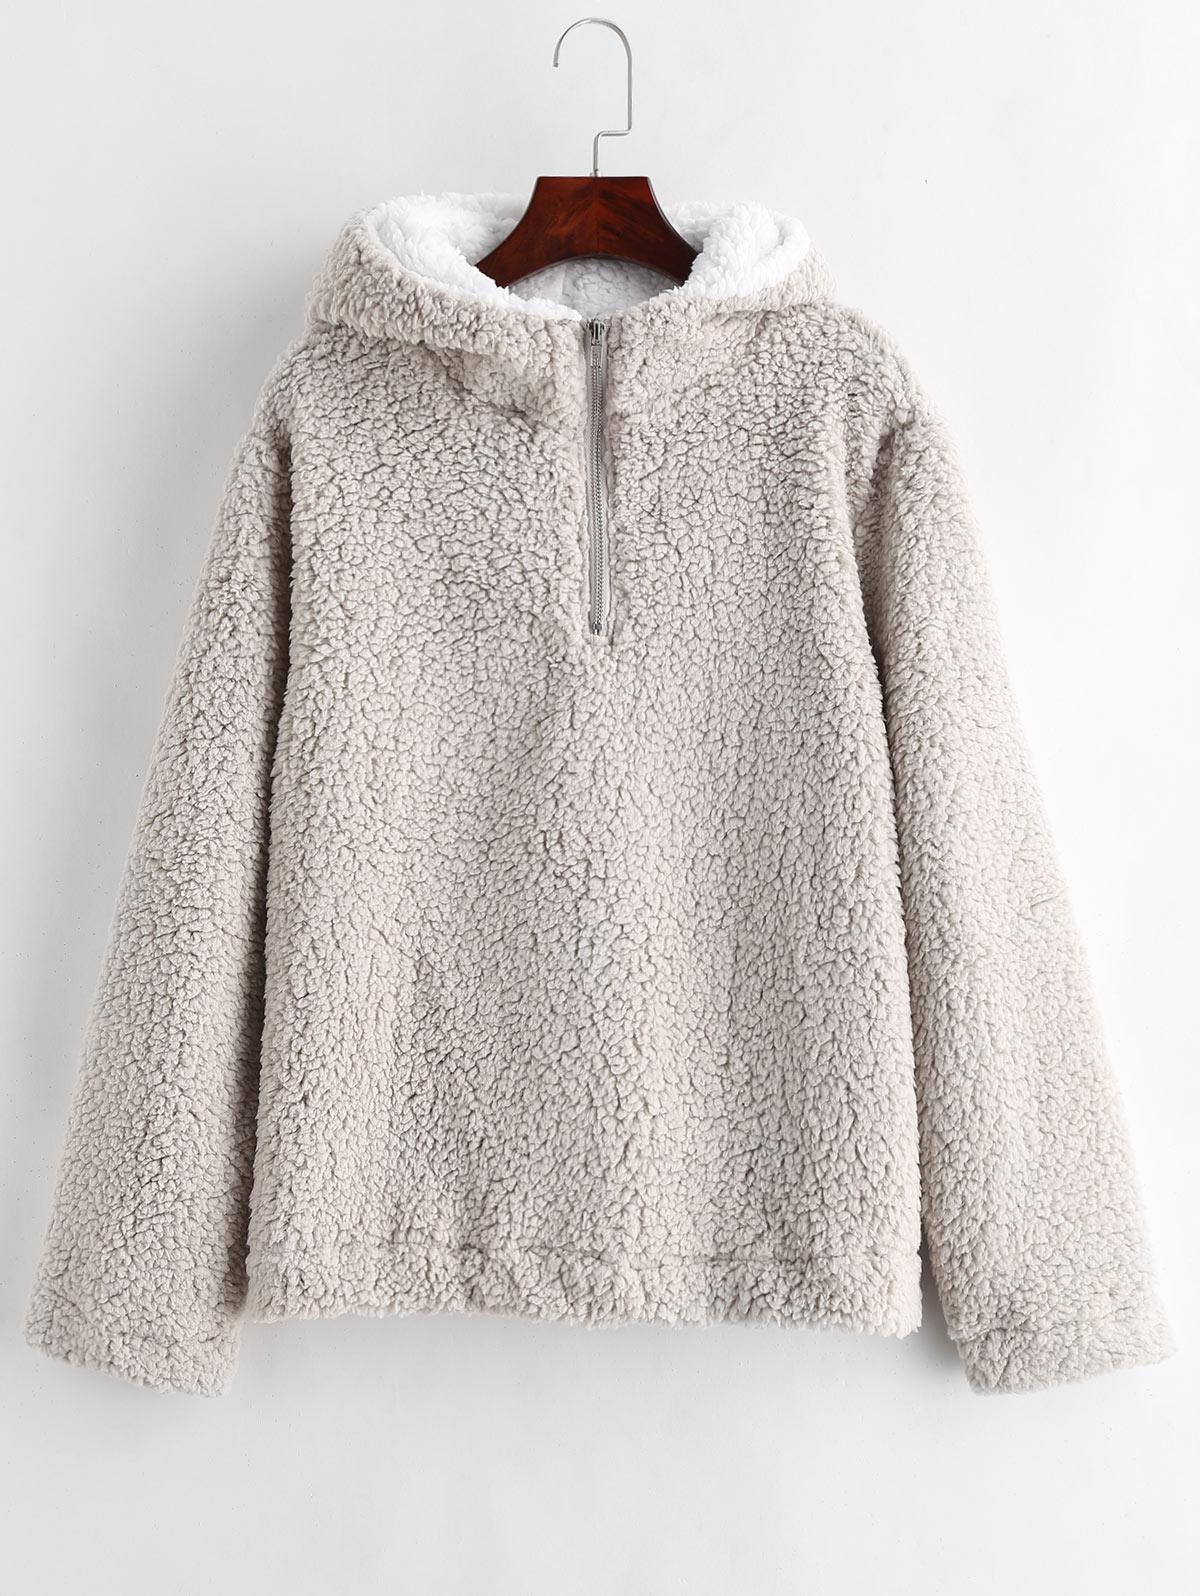 Women Winter Fluffy Fur Sweatshirt Hoodies Jumper Cardigan Hooded Tops Pullover